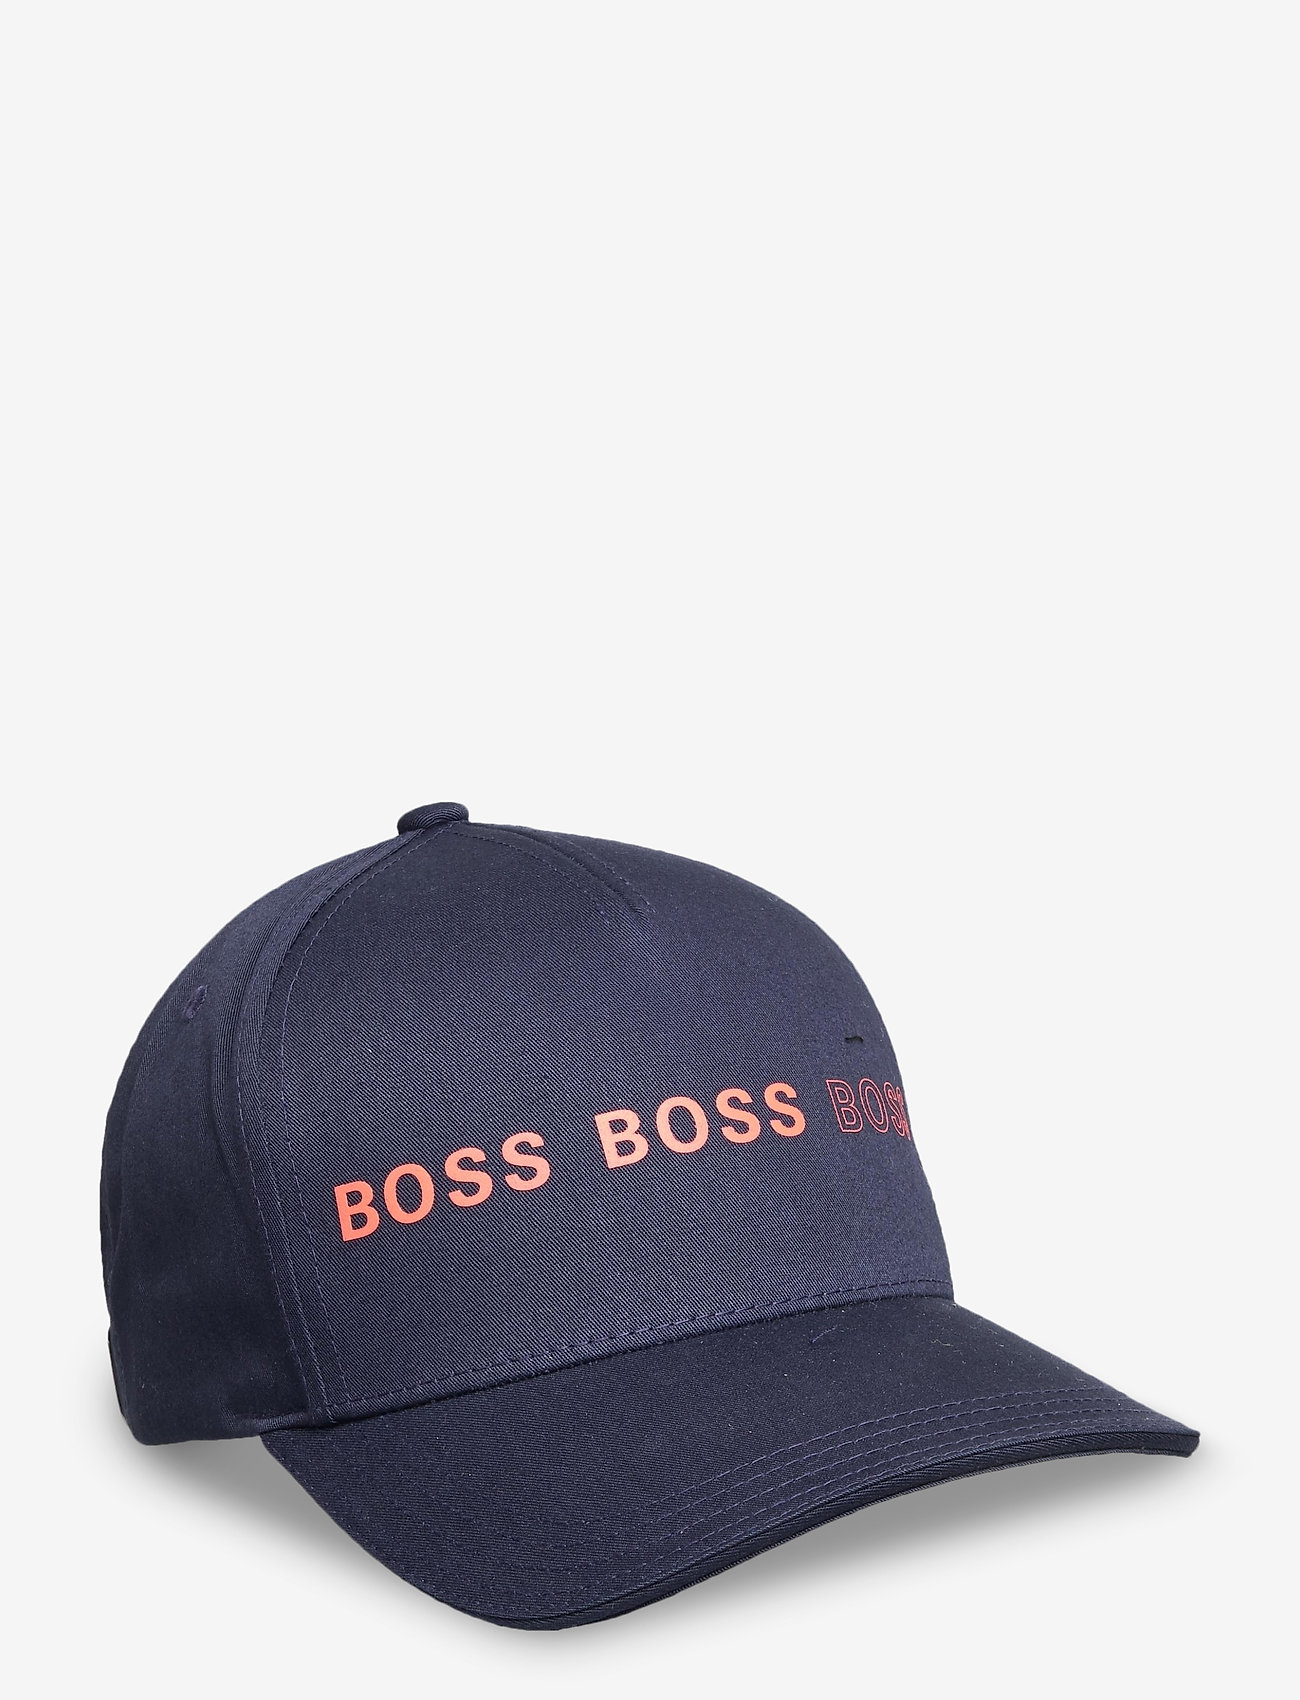 BOSS Cap double Navy   20.9209 kr   Boozt.com